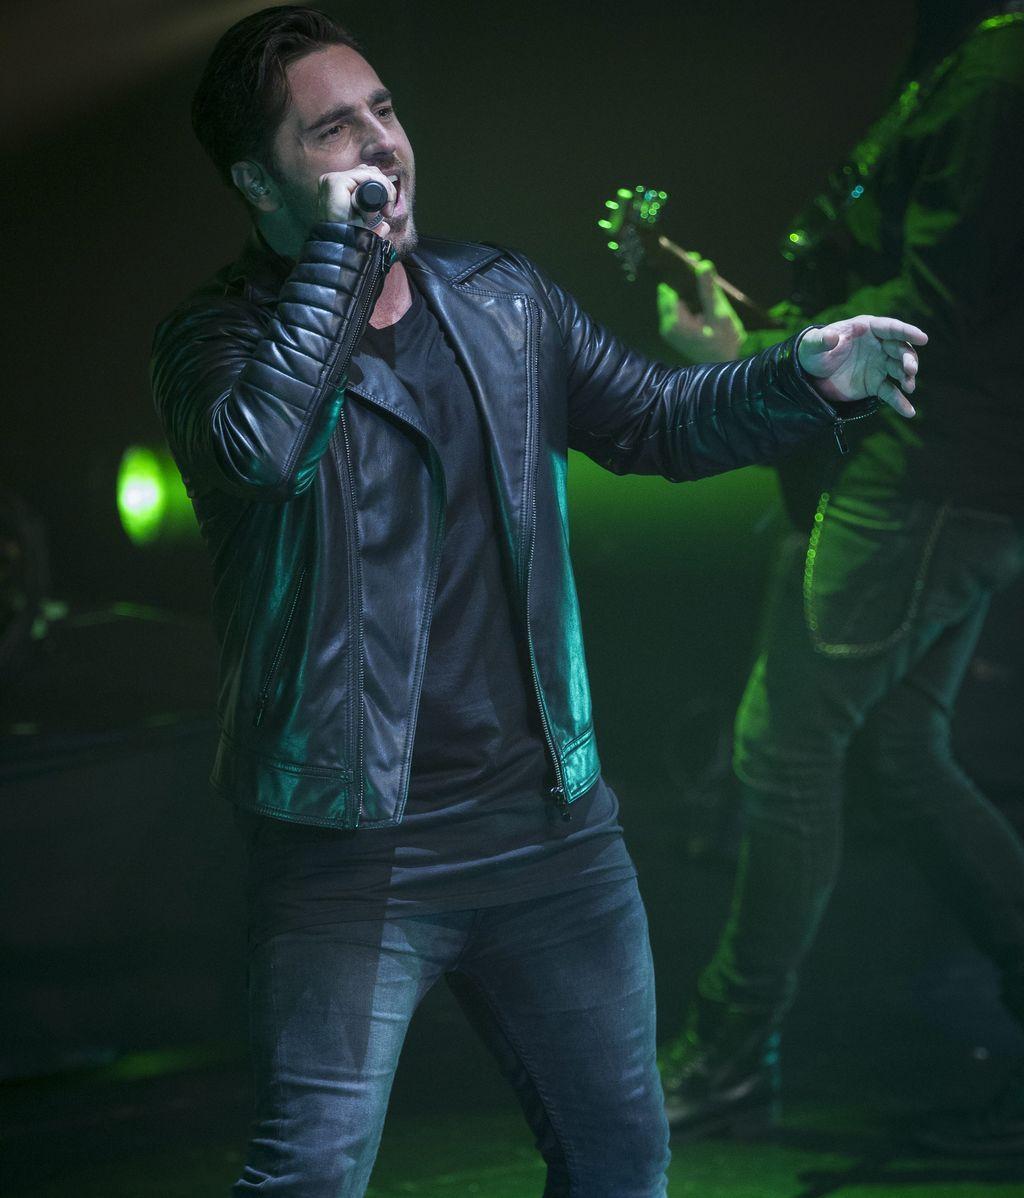 El_cantante_cantabro_Davi_3